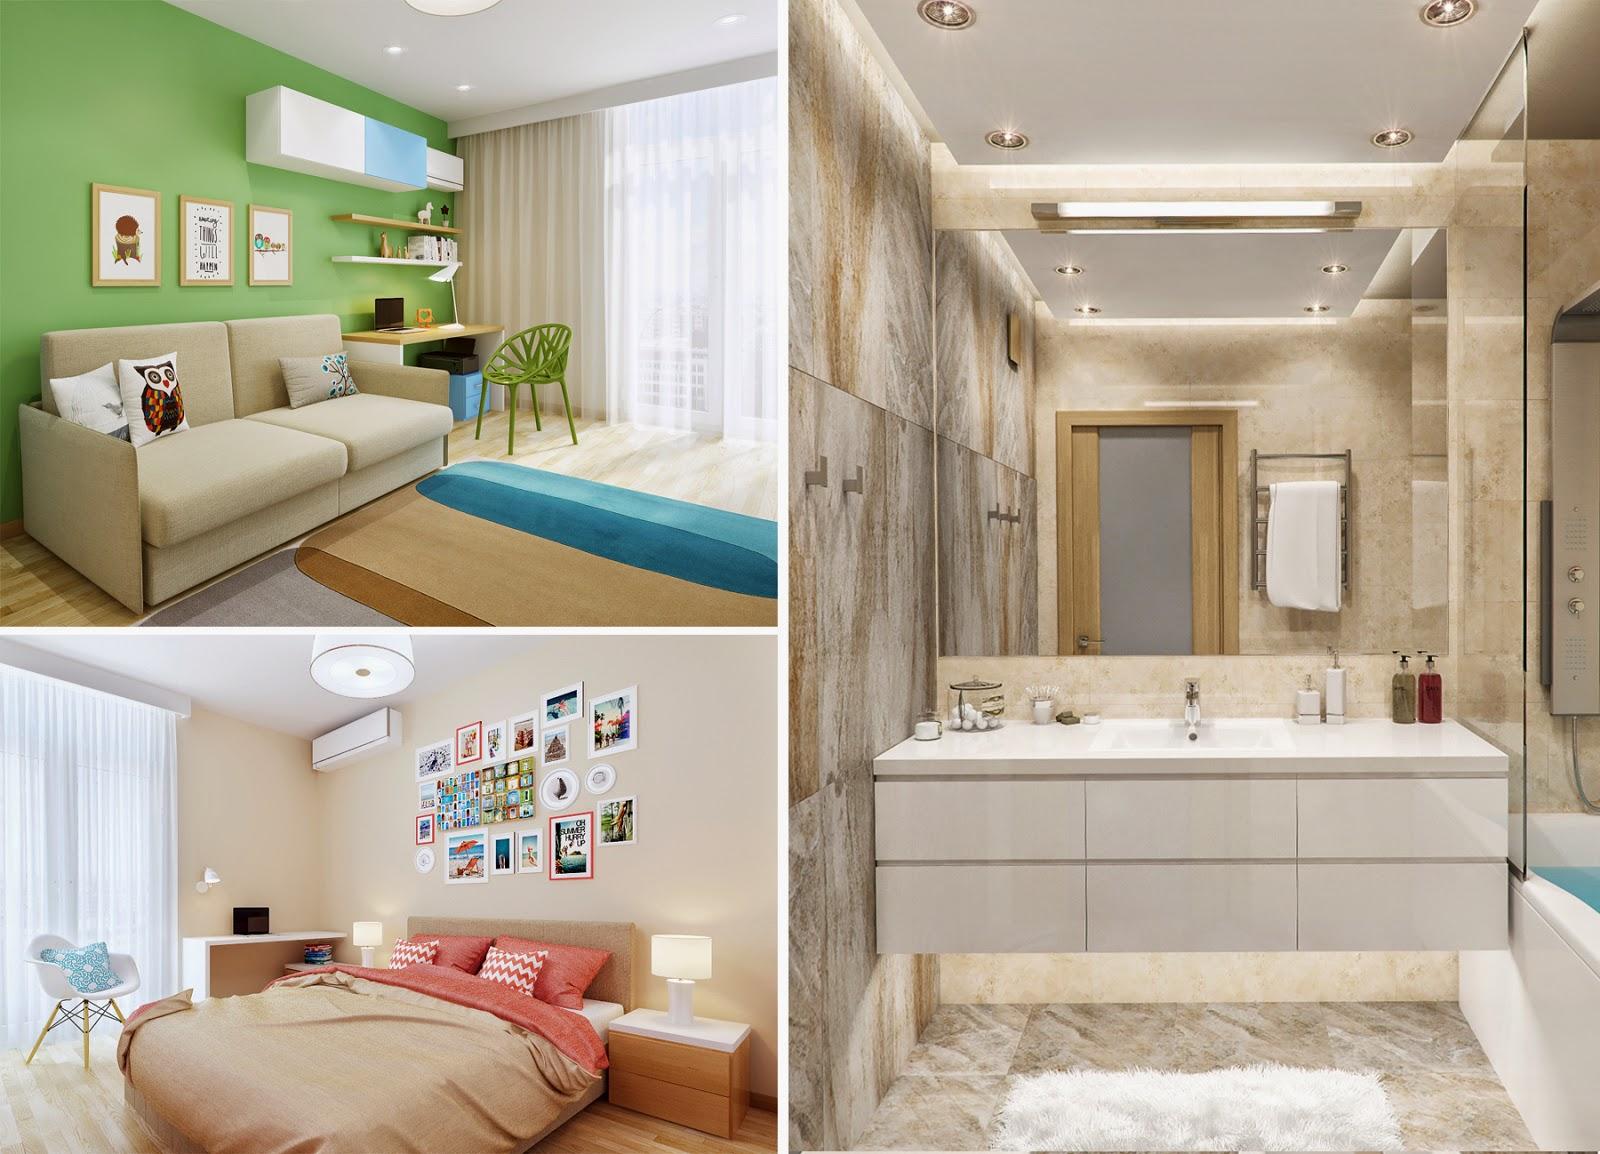 Дизайн трехкомнатной квартиры в Комфорт Тауне